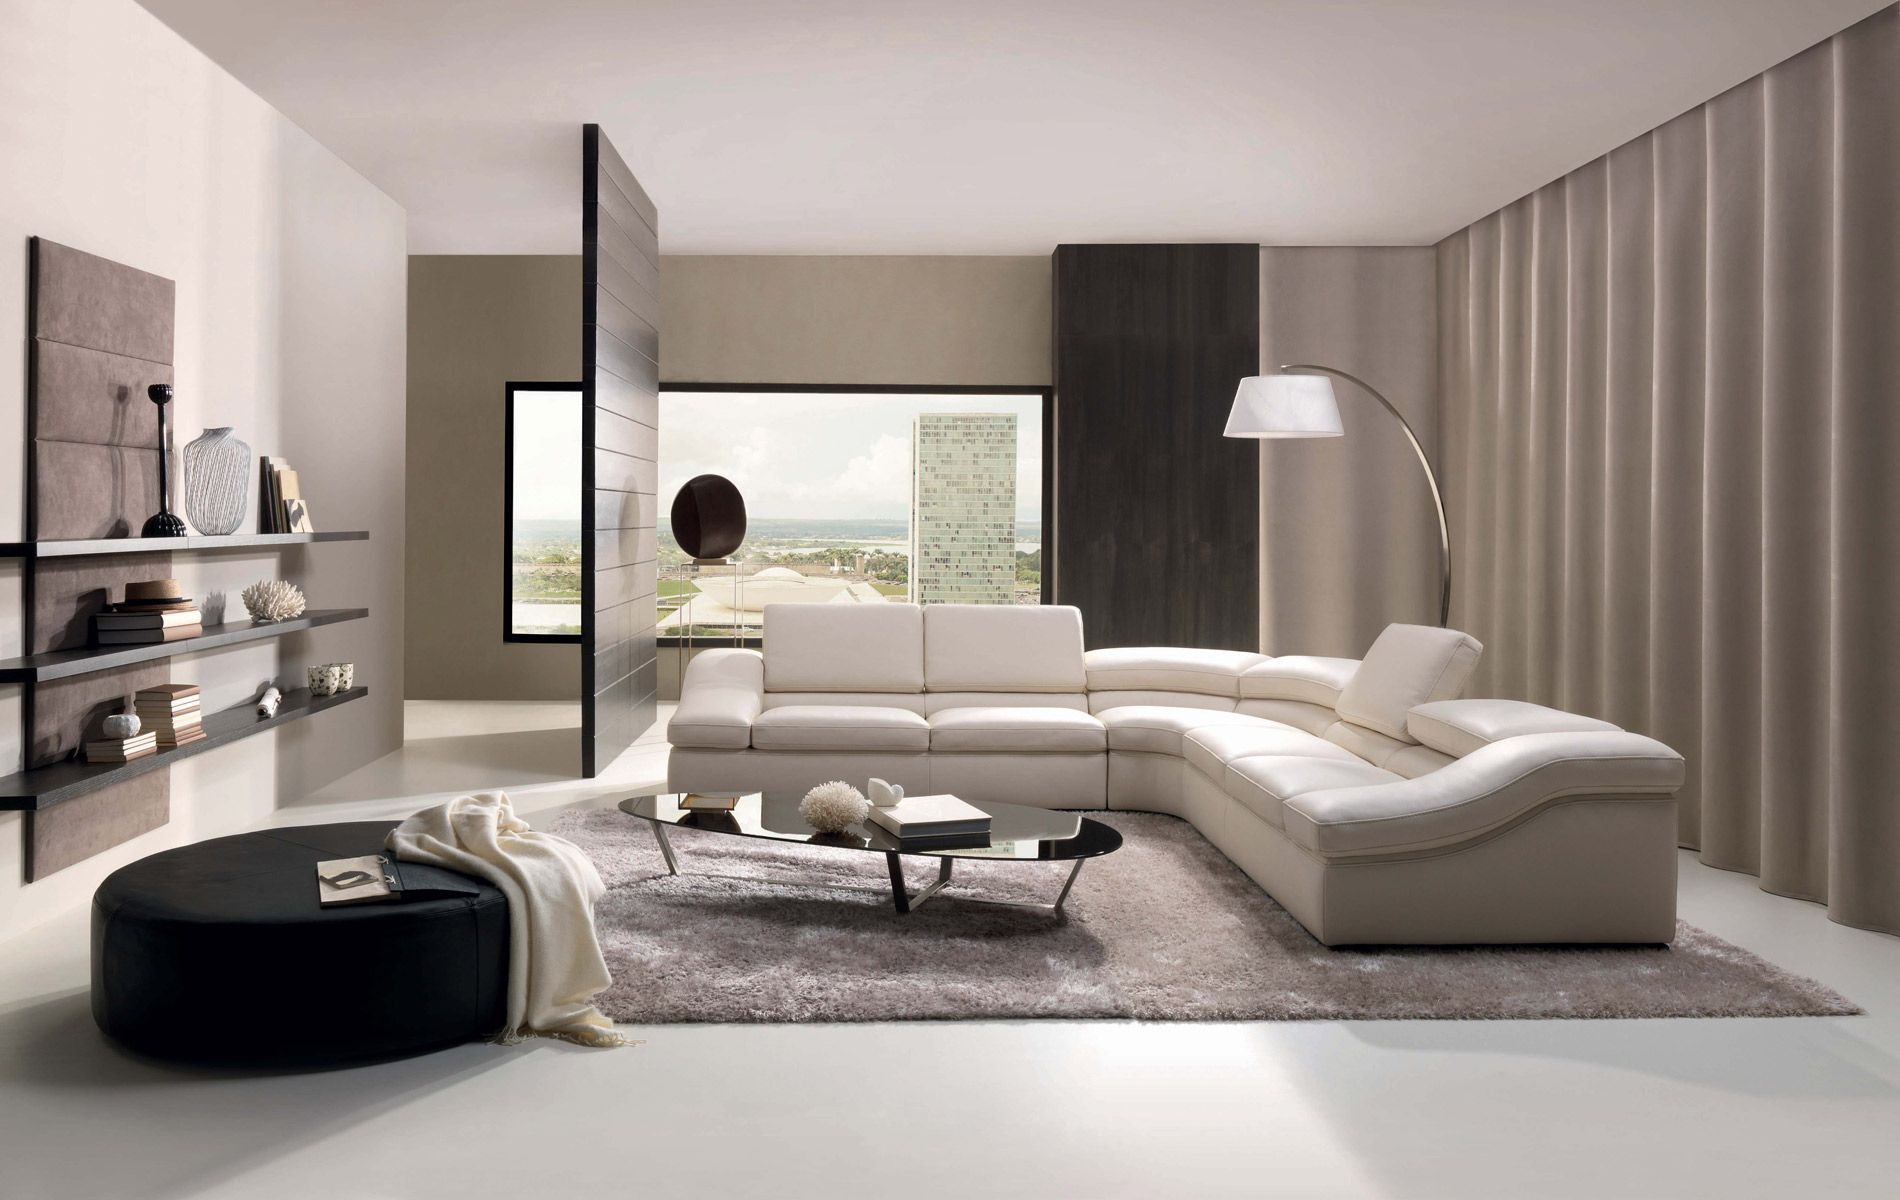 Idee Deco Salon Design 15+ helpful ideas for designing your living room [photos